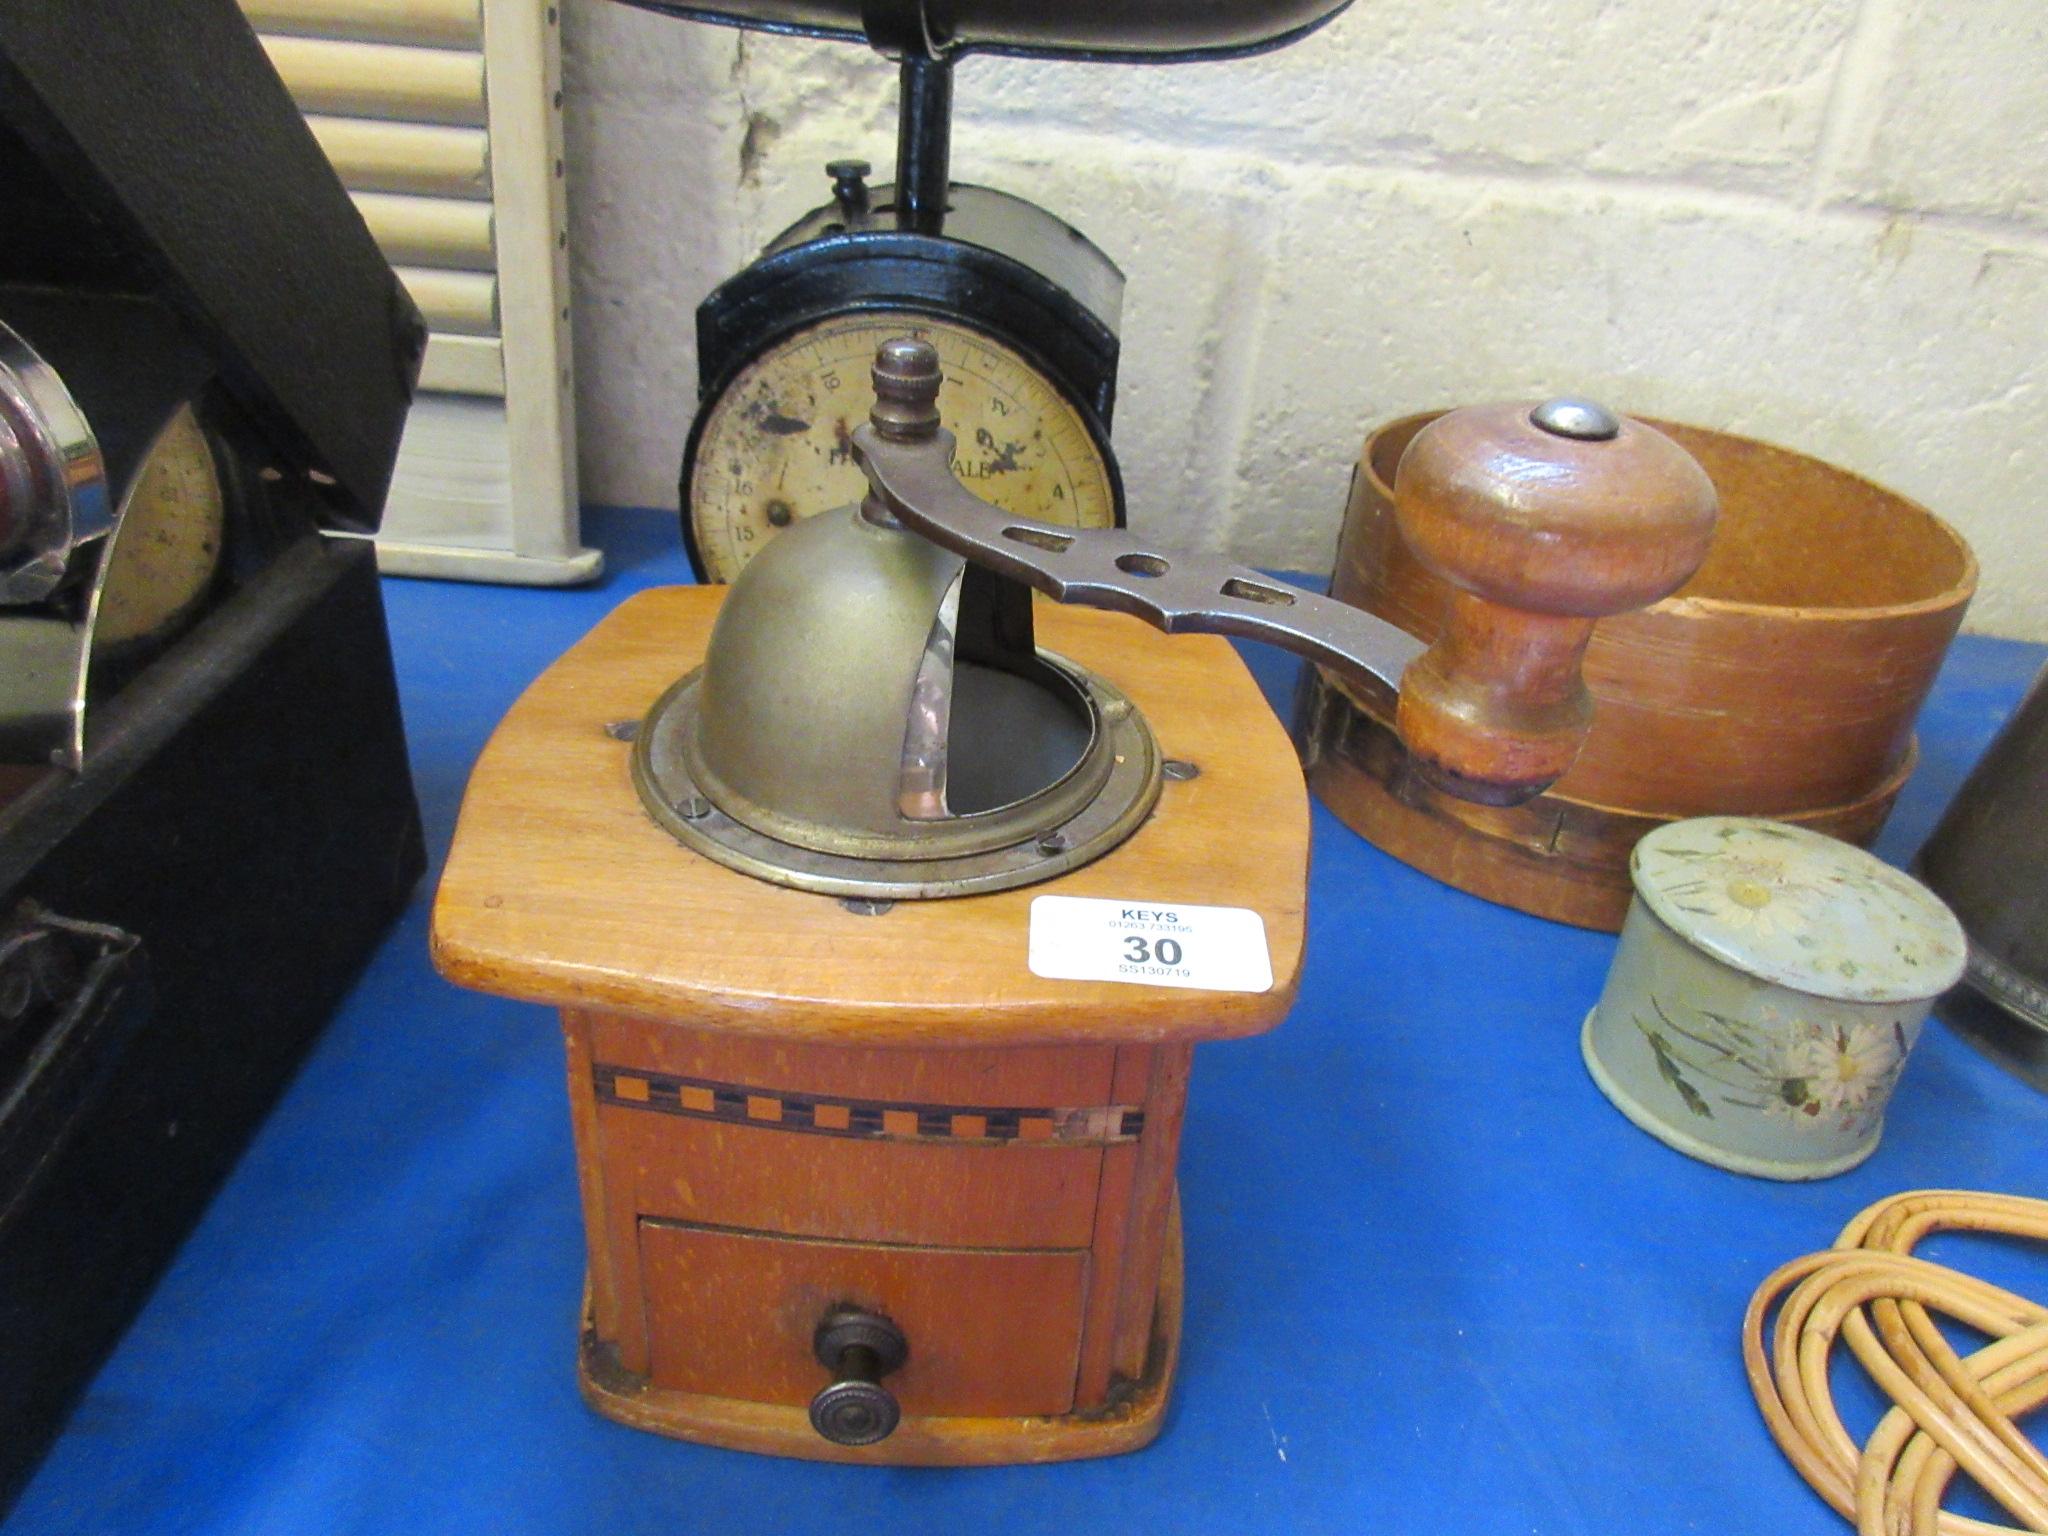 Lot 30 - Inlaid coffee grinder